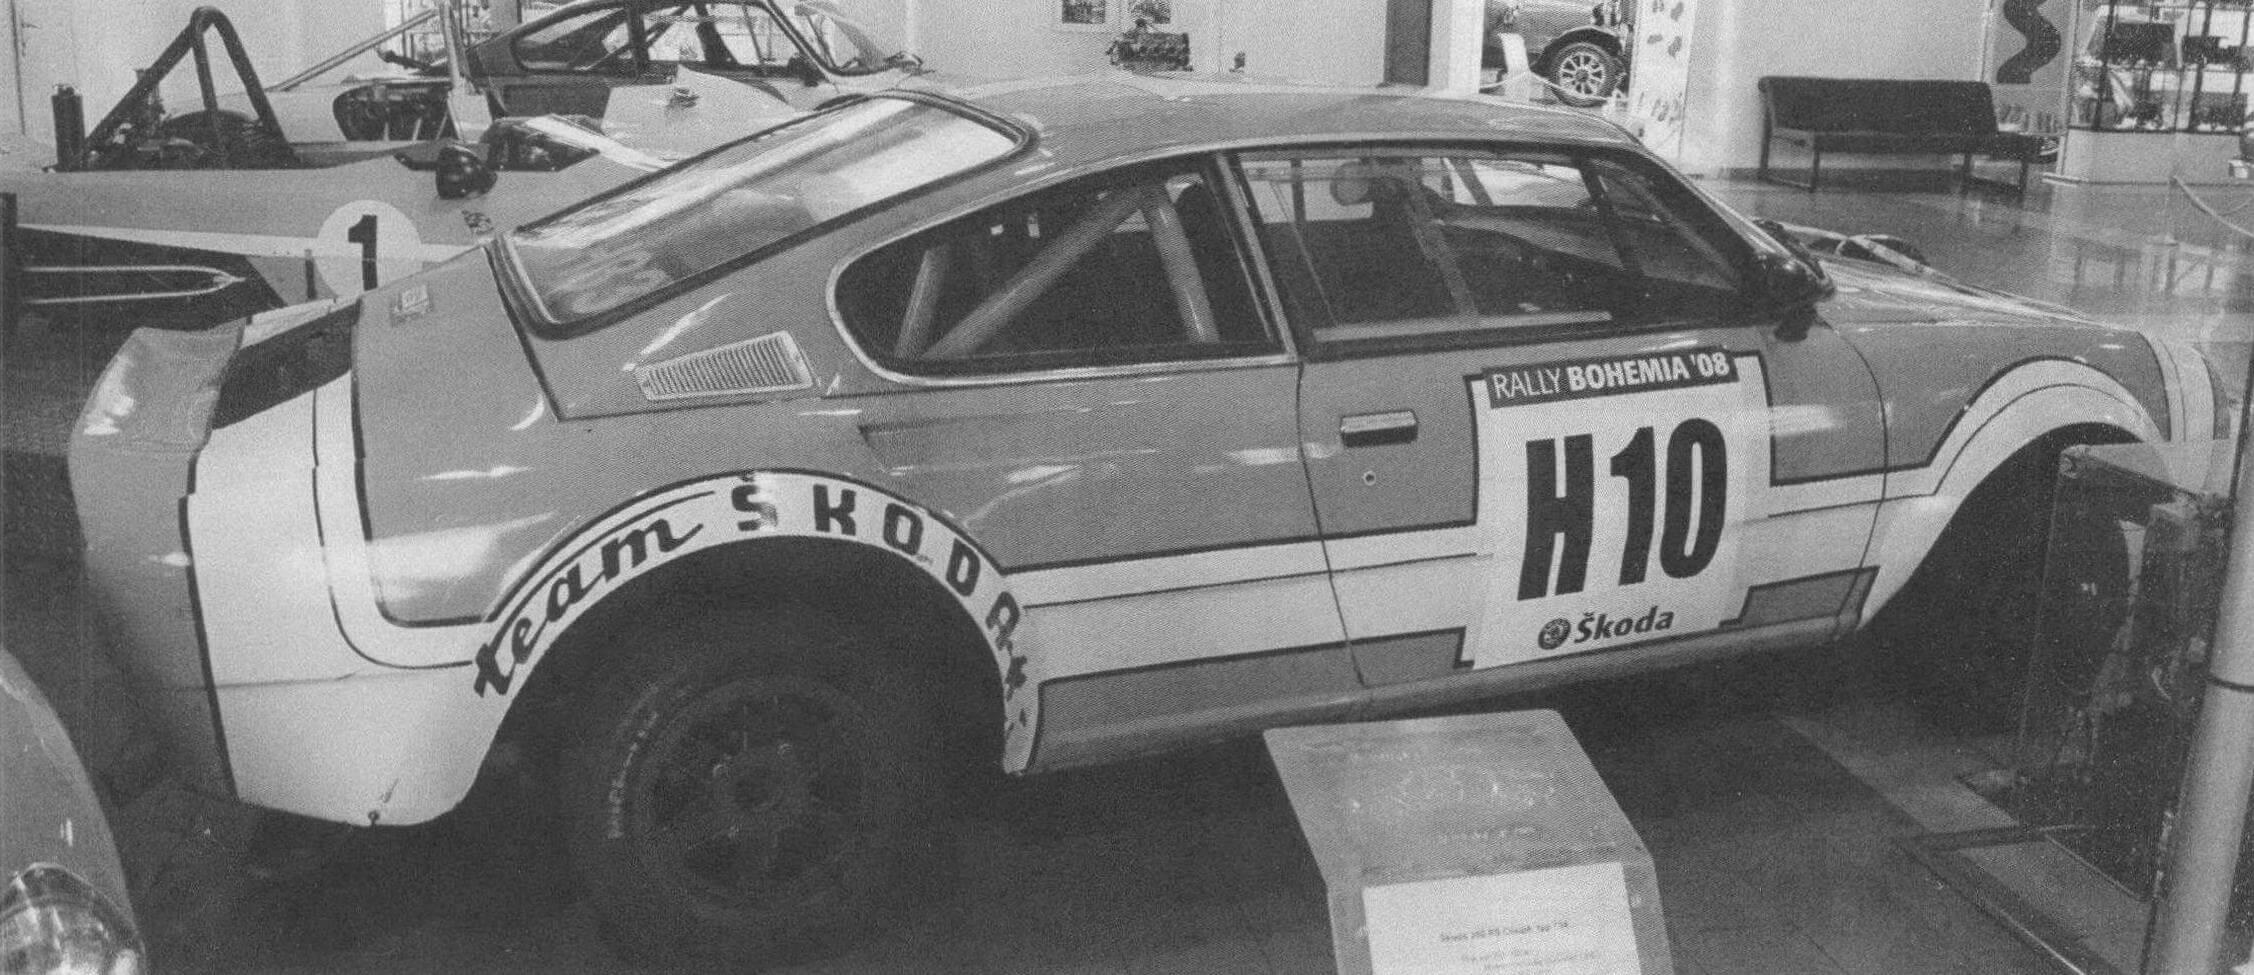 Опытный экземпляр Skoda 200 RS